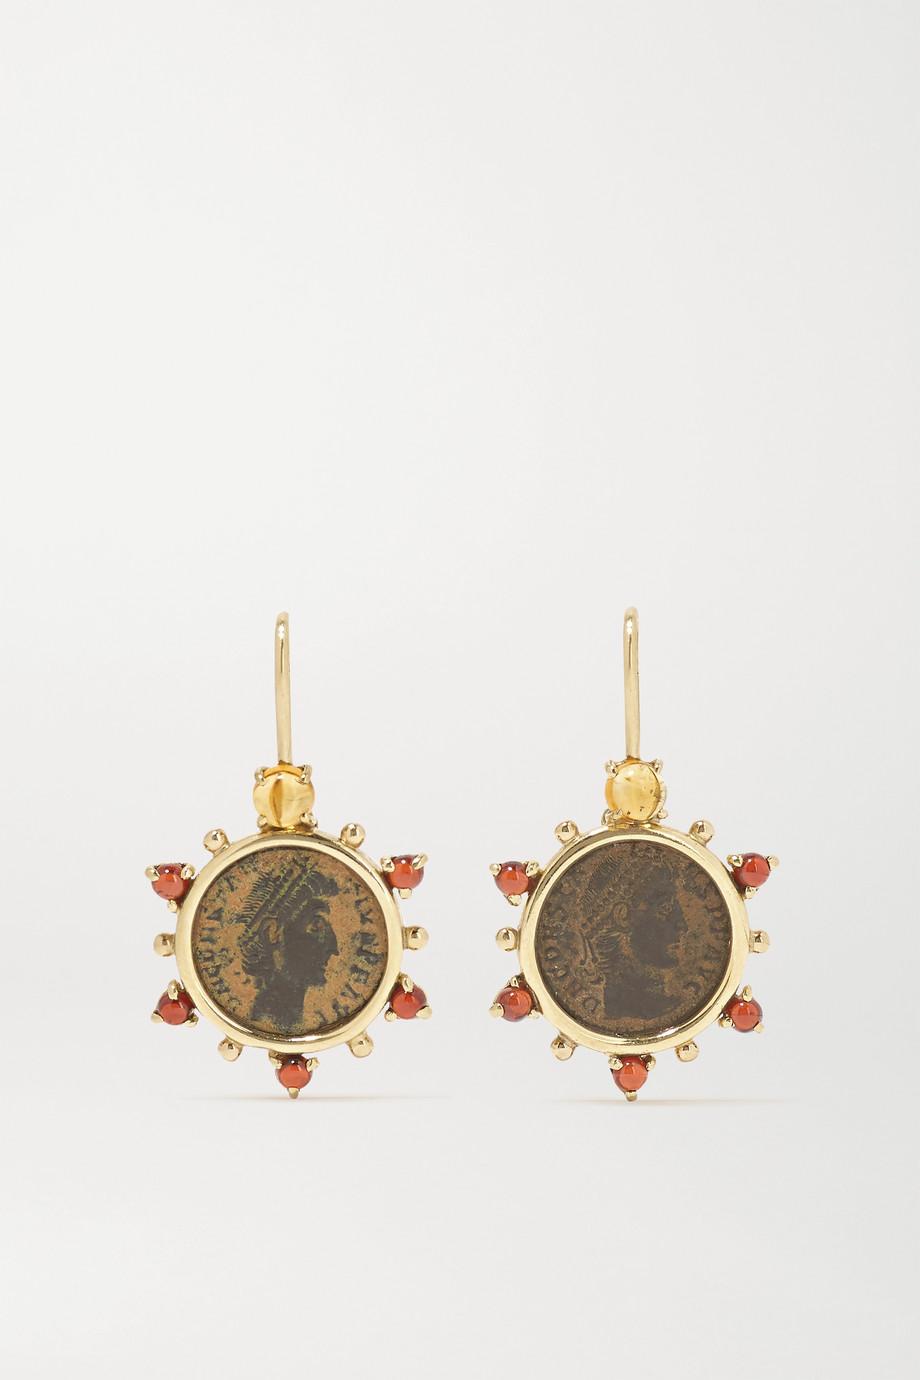 Dubini Empress 18-karat gold, citrine and garnet earrings